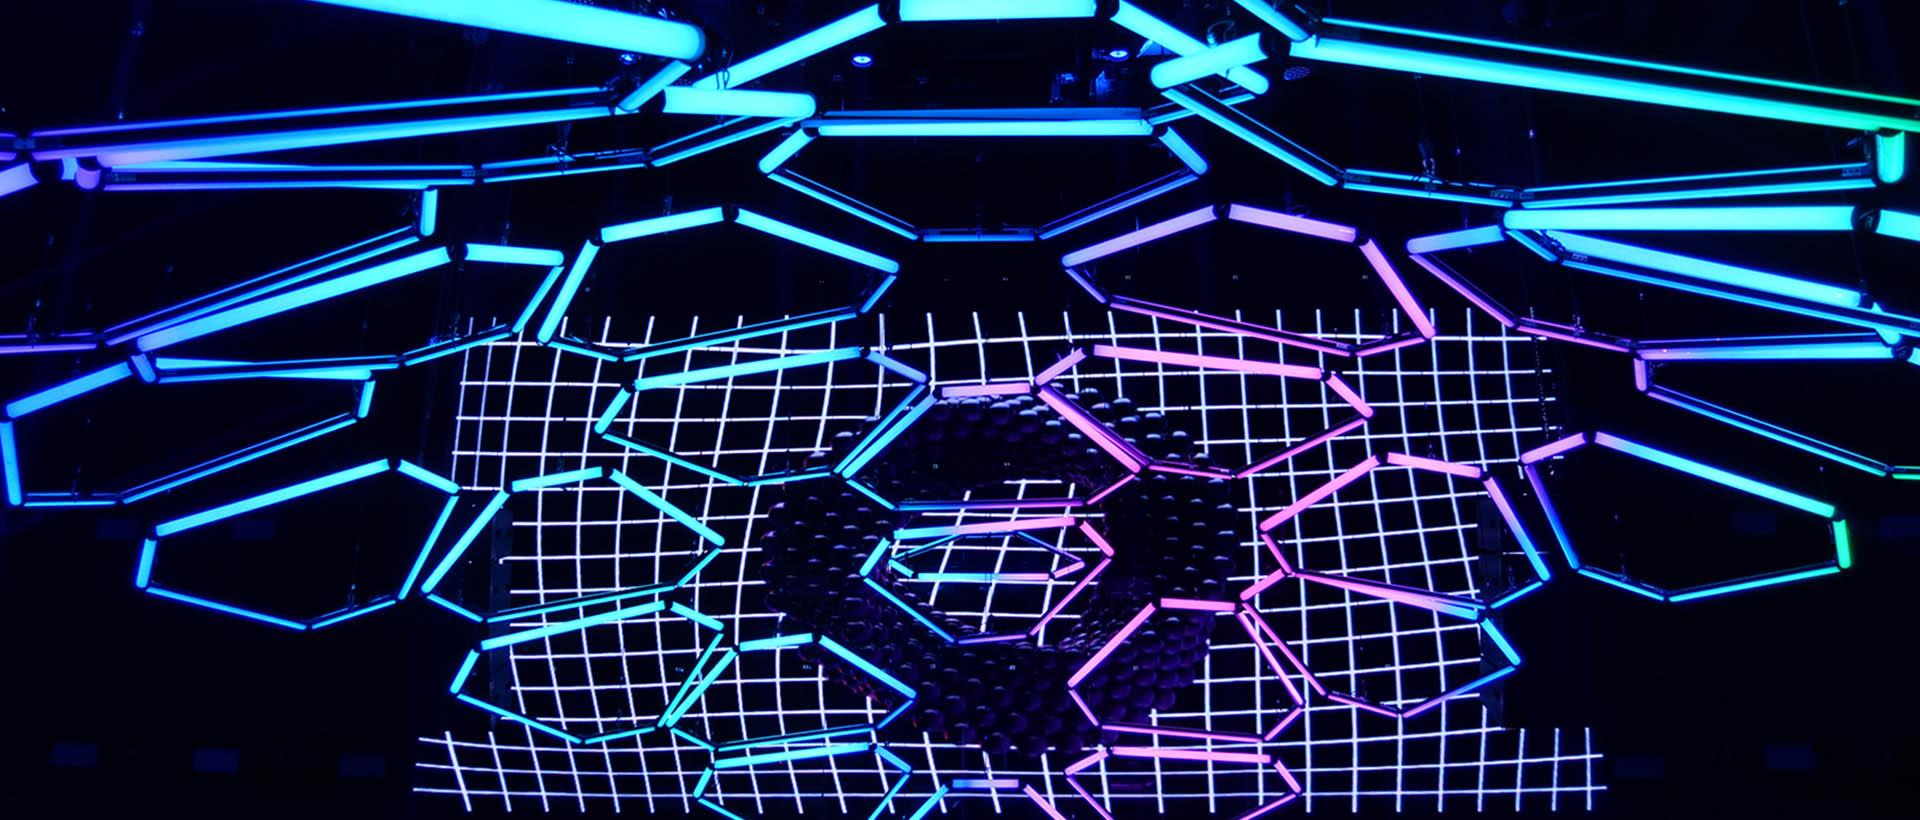 SUPER HOUSE Night club kinetic lighting system Wholesale Kinetic Lighting (4)